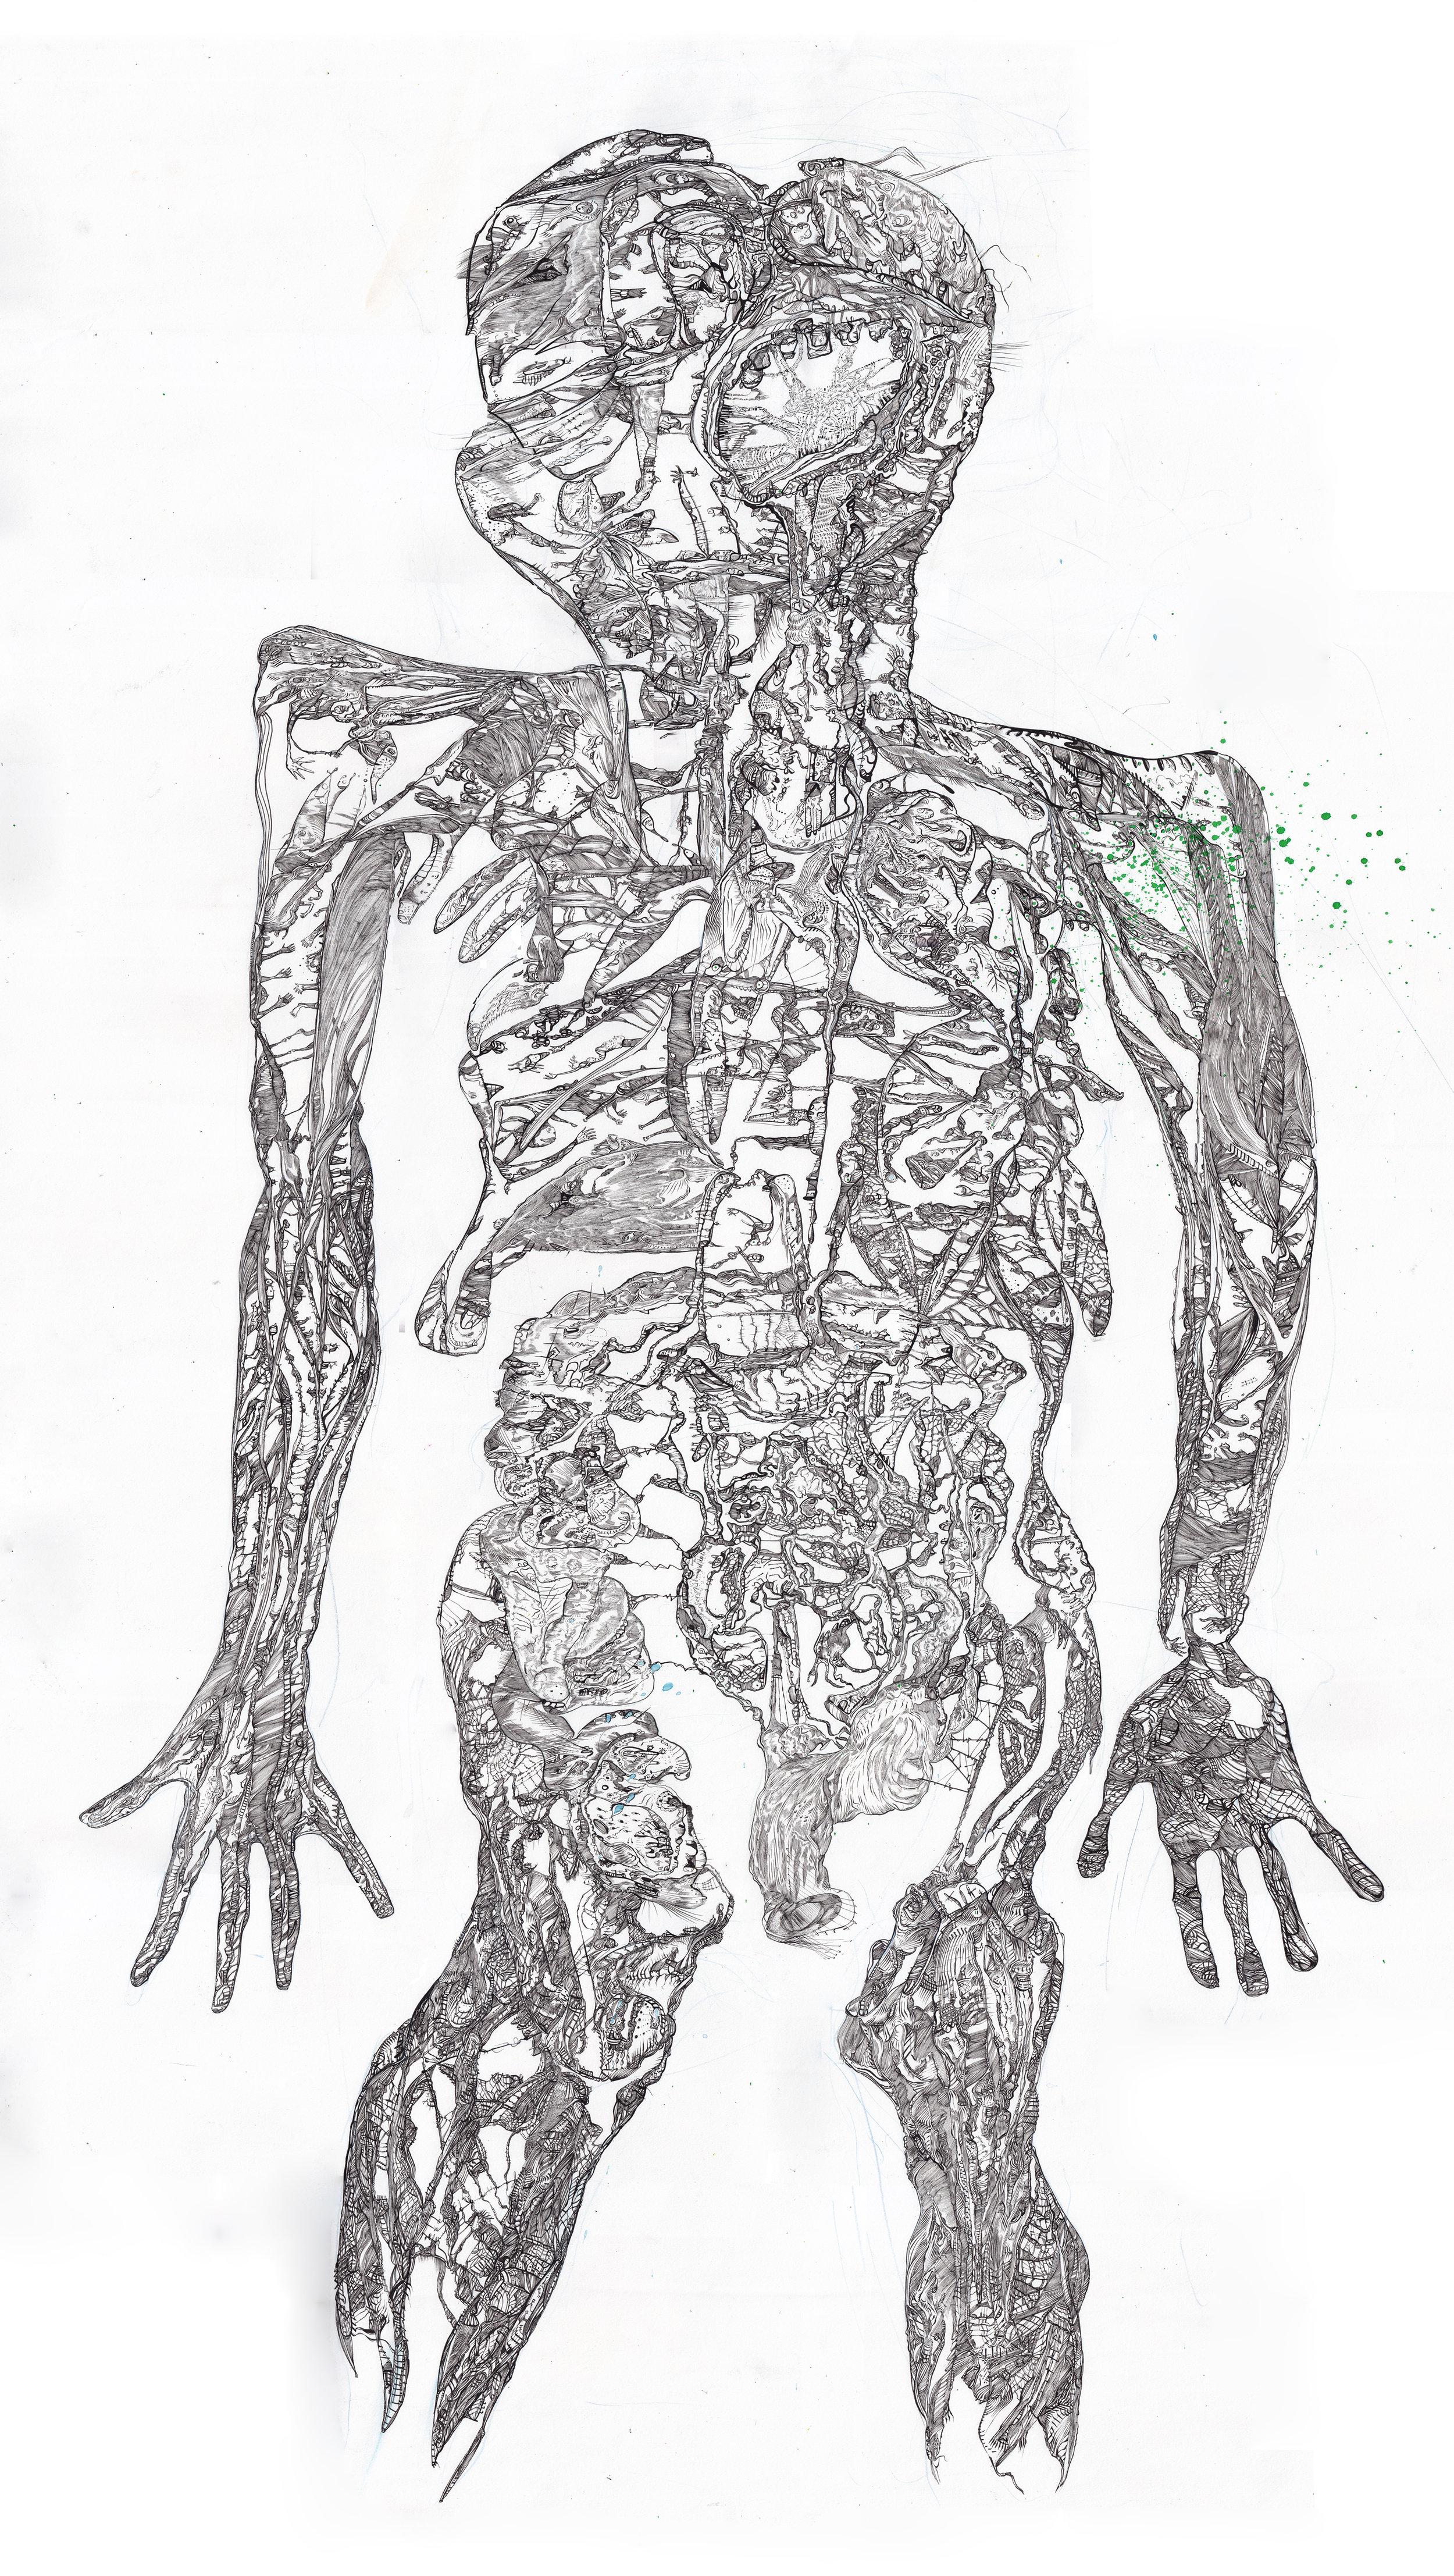 """body""  Pen & Ink on Paper 3.5' x 5' 2016"